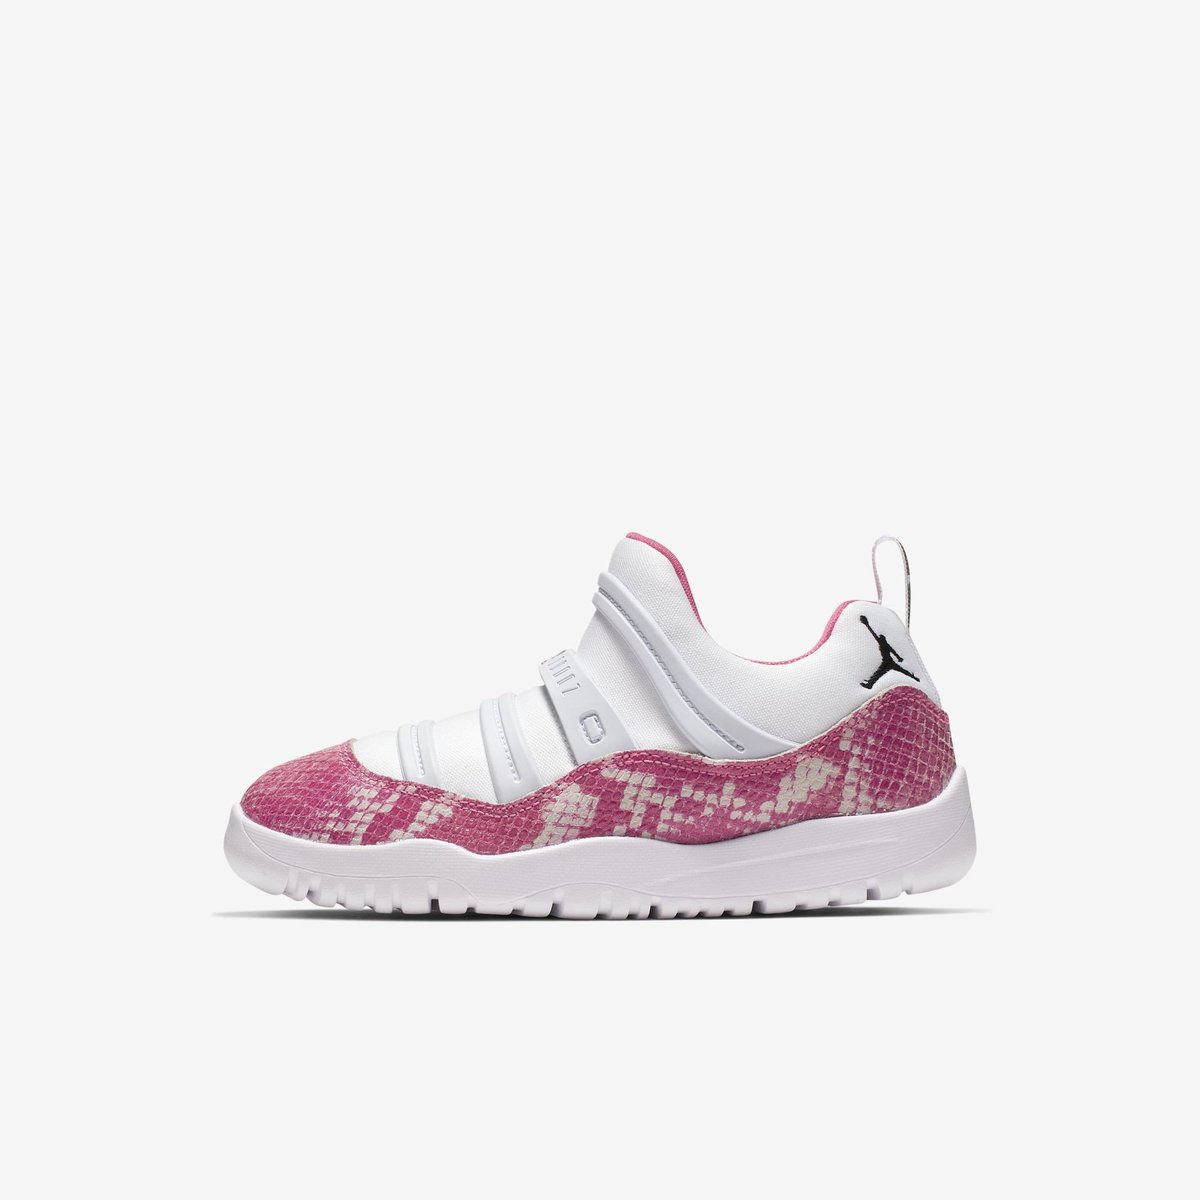 "a48c223c508 Kids ""Pink Snakeskin"" Jordan 11 Little Flex on Finish Line with FREE  shipping Preschool -> https://go.j23app.com/bqi Toddler ->  https://go.j23app.com/bpq ..."